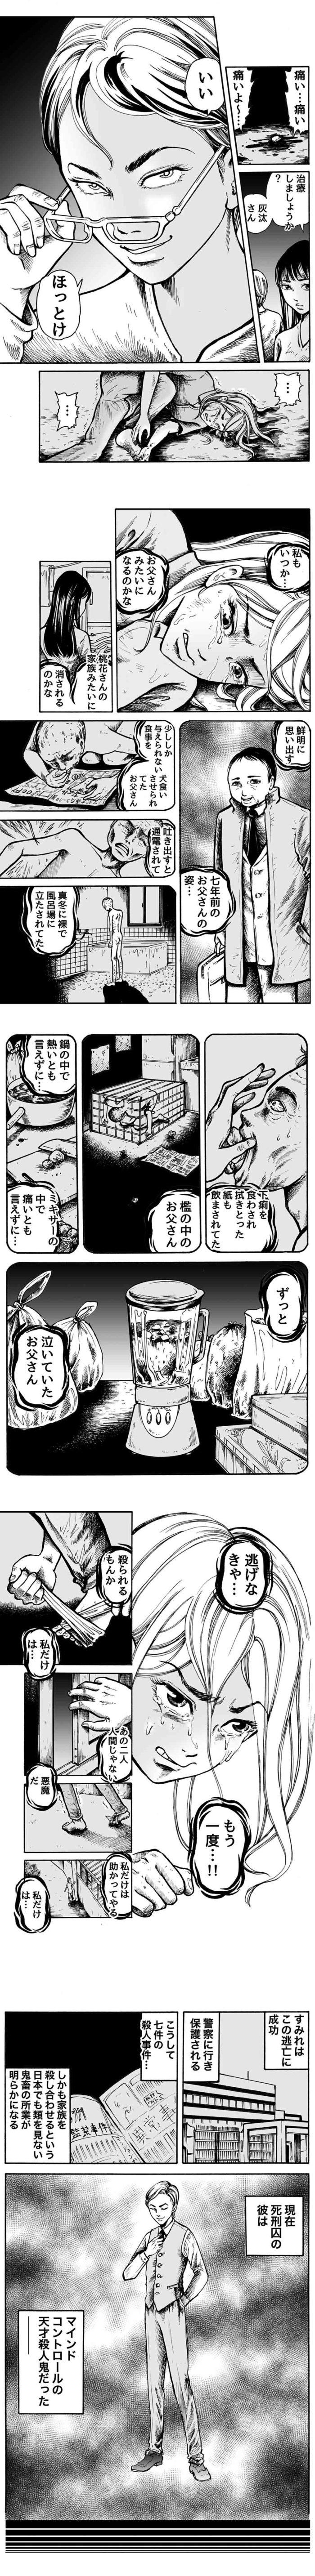 kyouaku-satsujin01-03